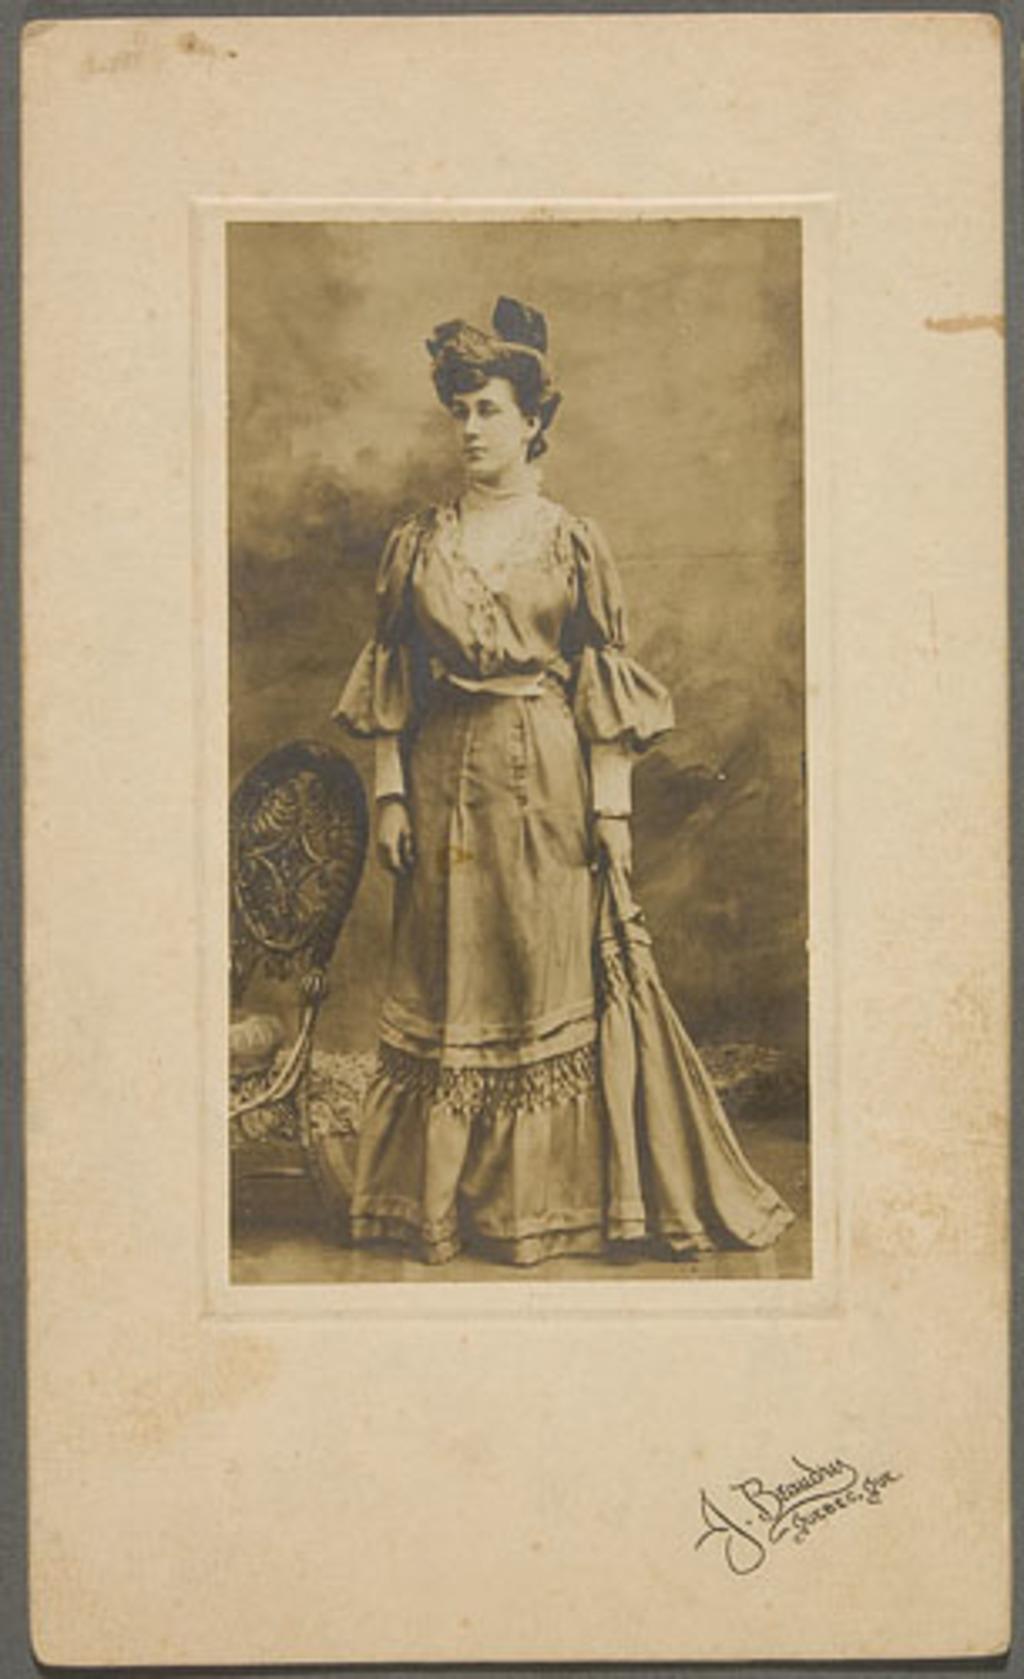 Mademoiselle Dumont